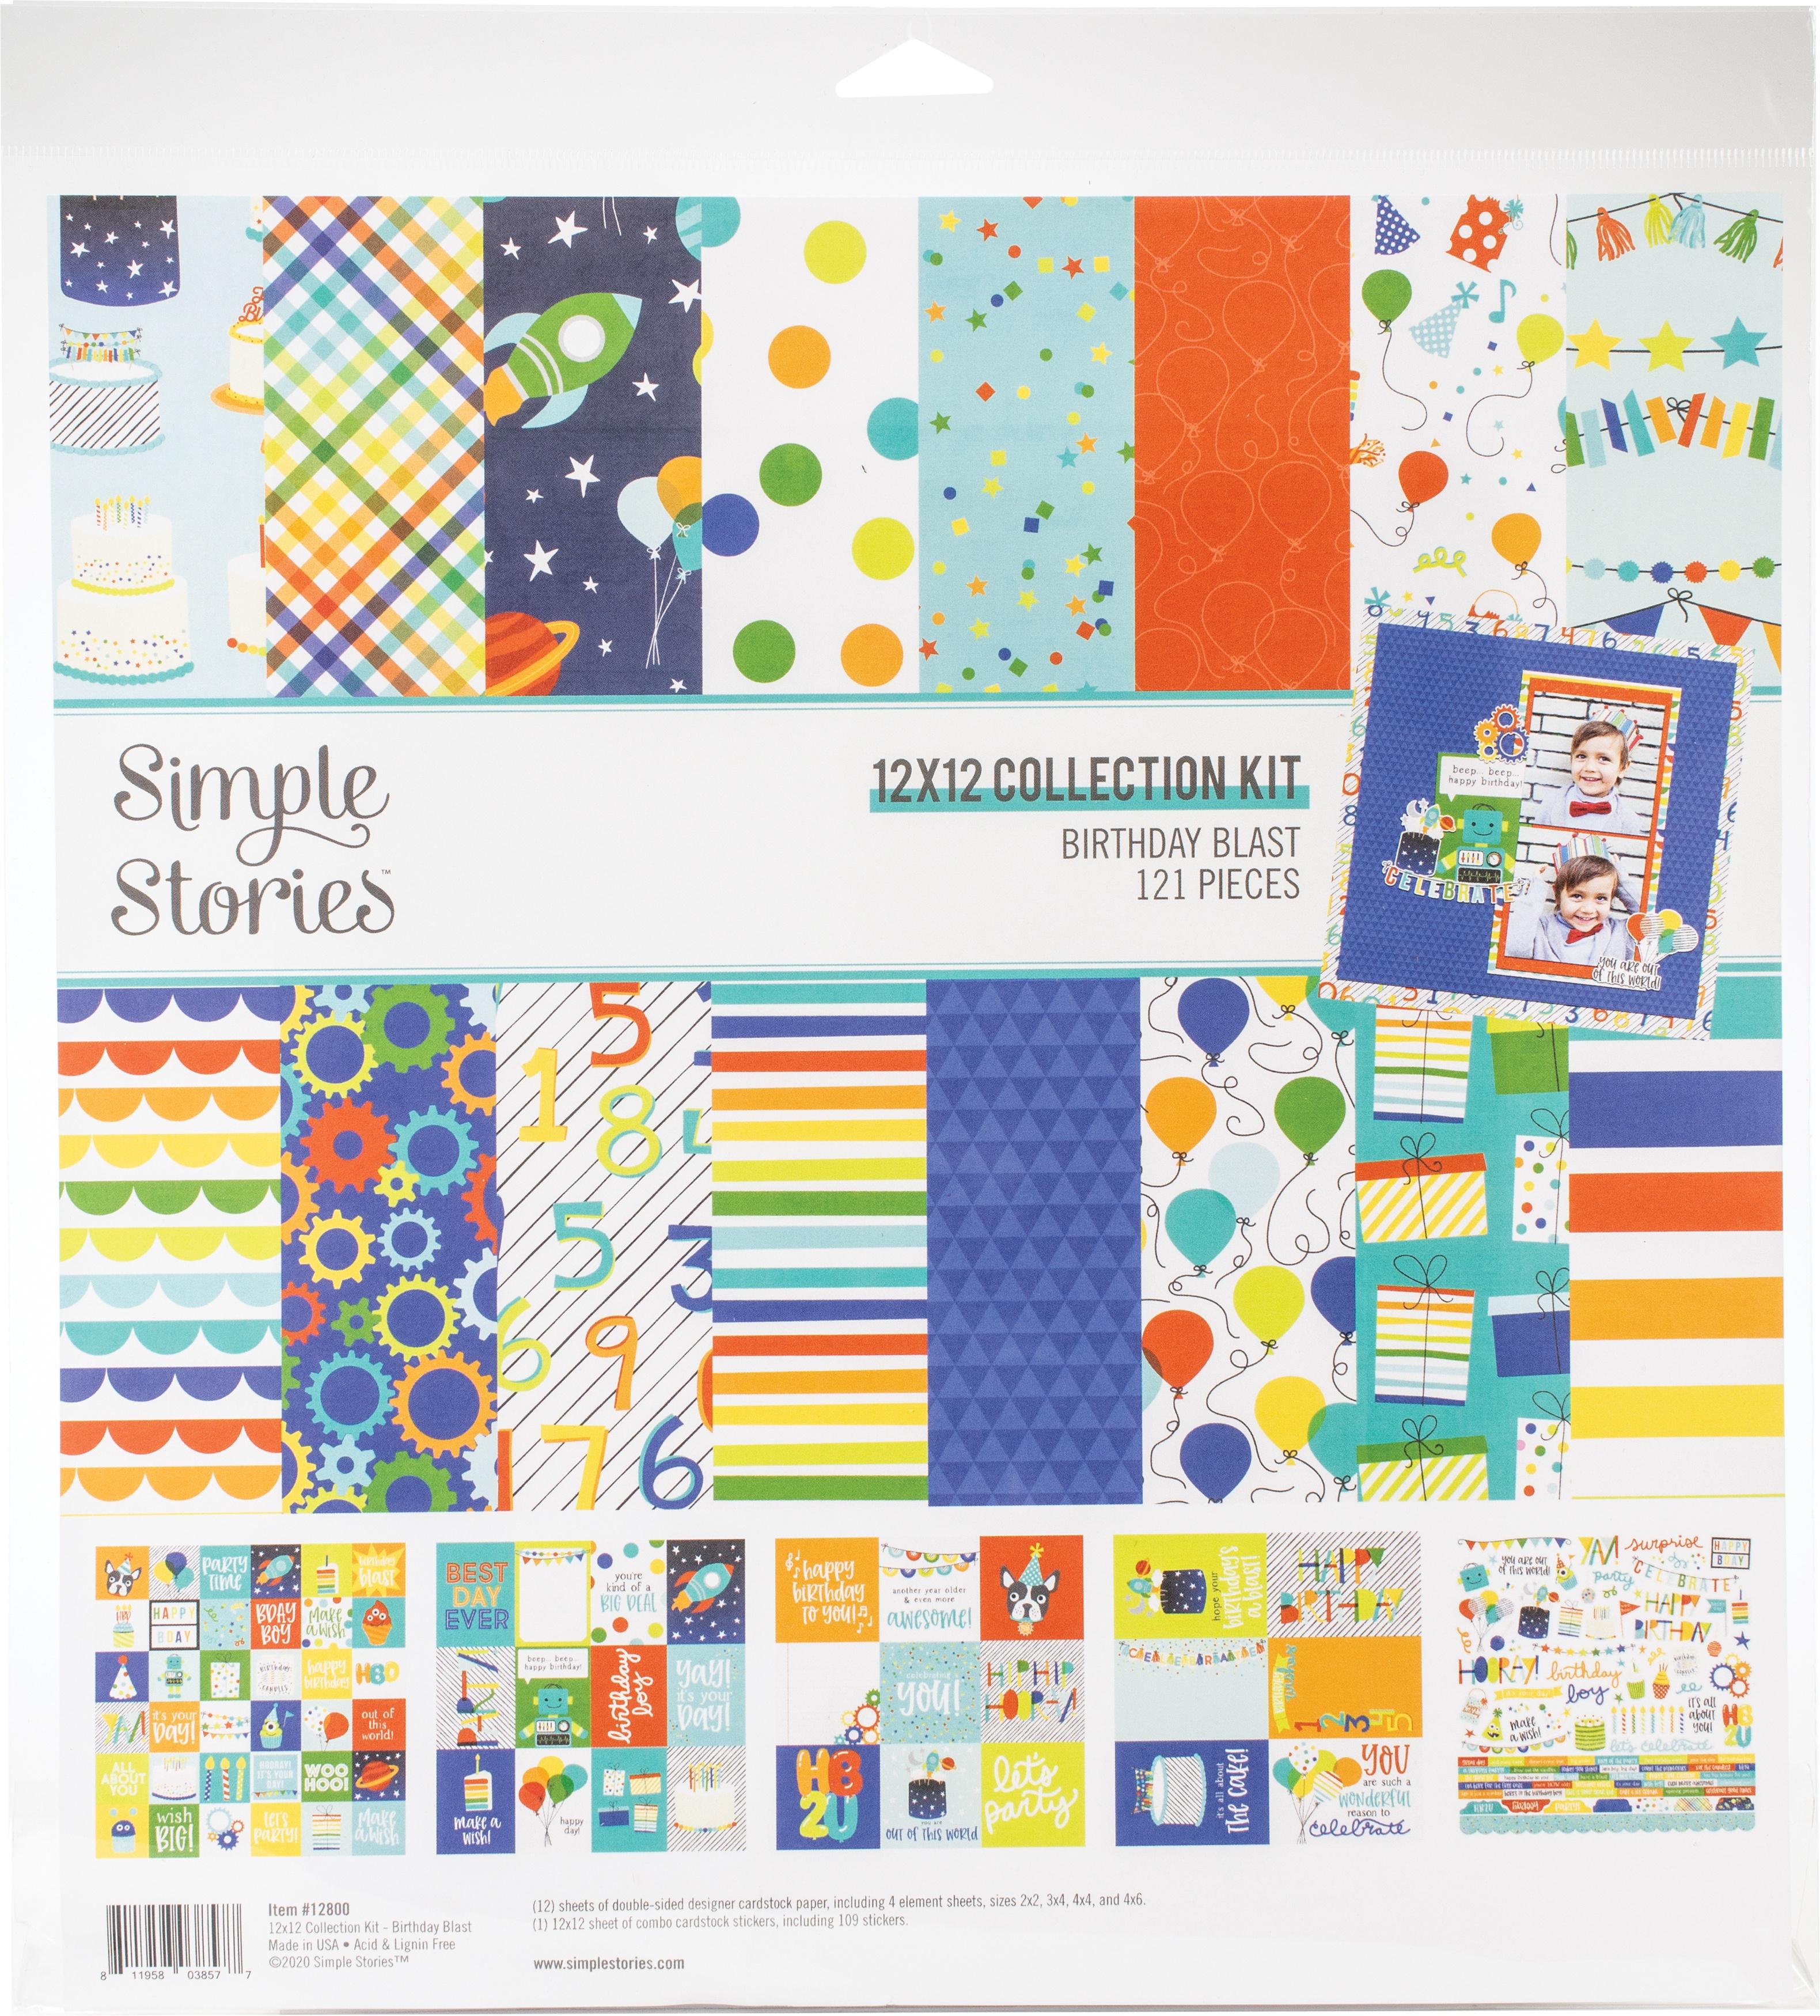 Birthday Blast Collection Kit 12X12 - Simple Stories